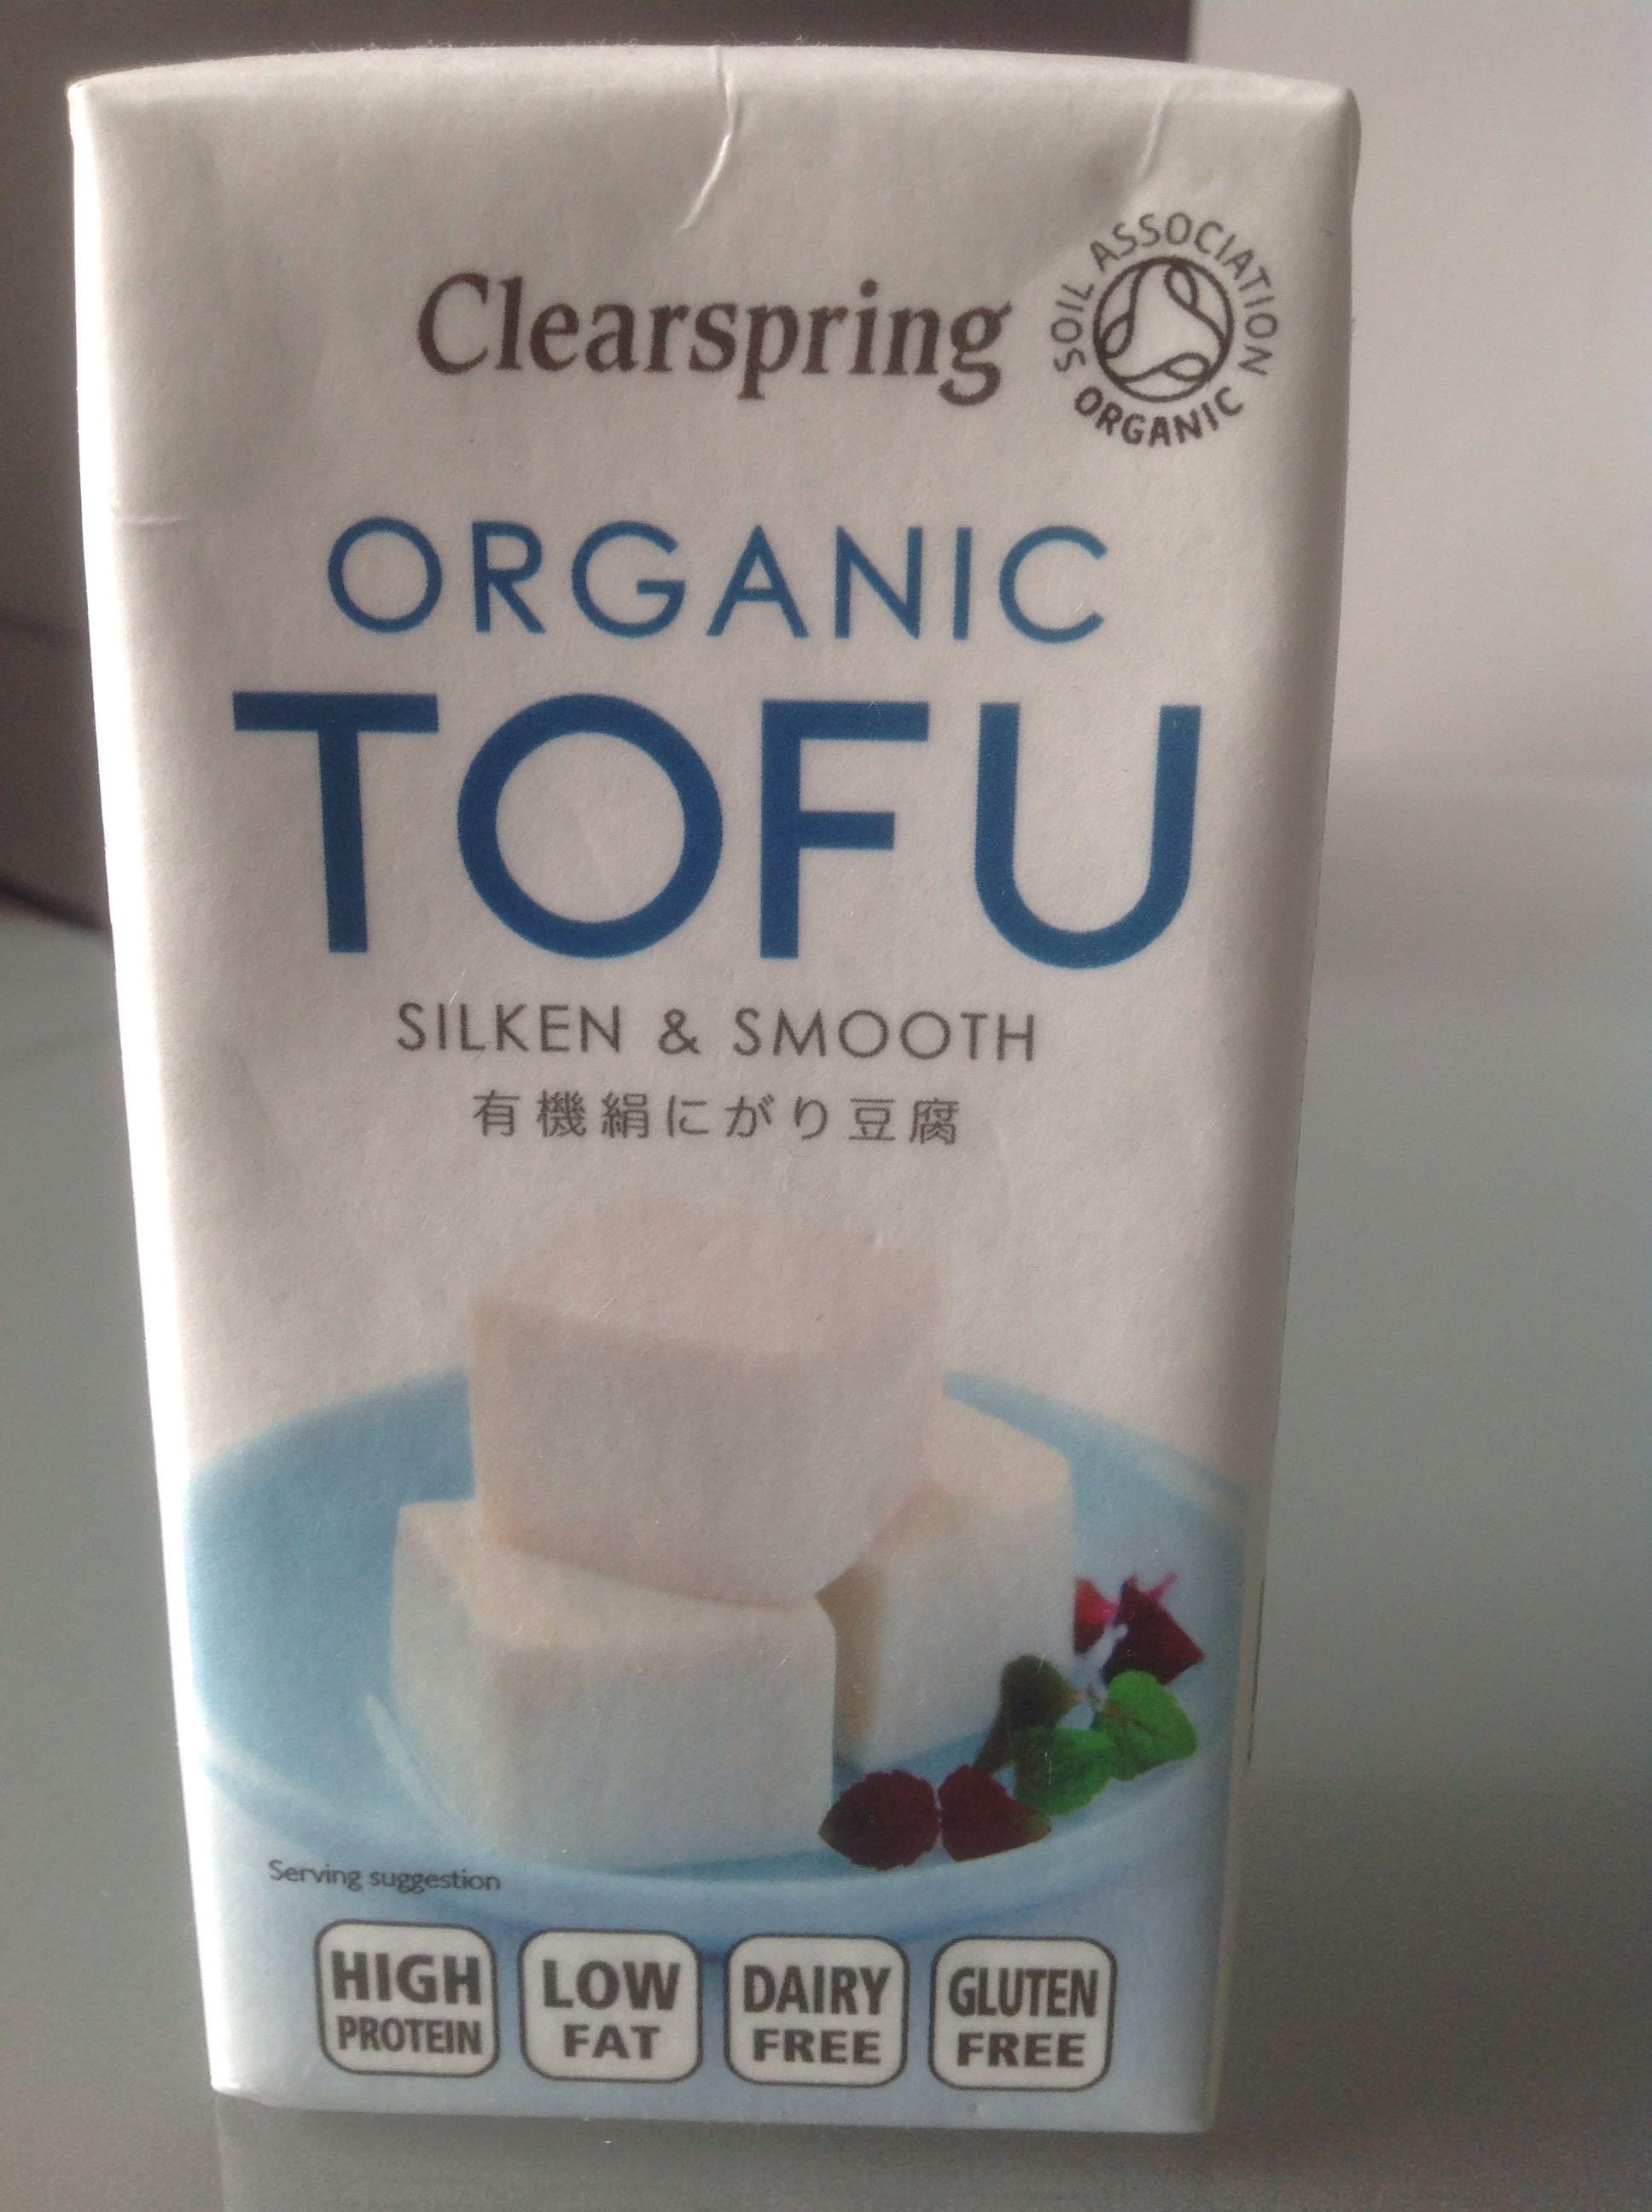 Organic tofu silken & smooth - Product - fr